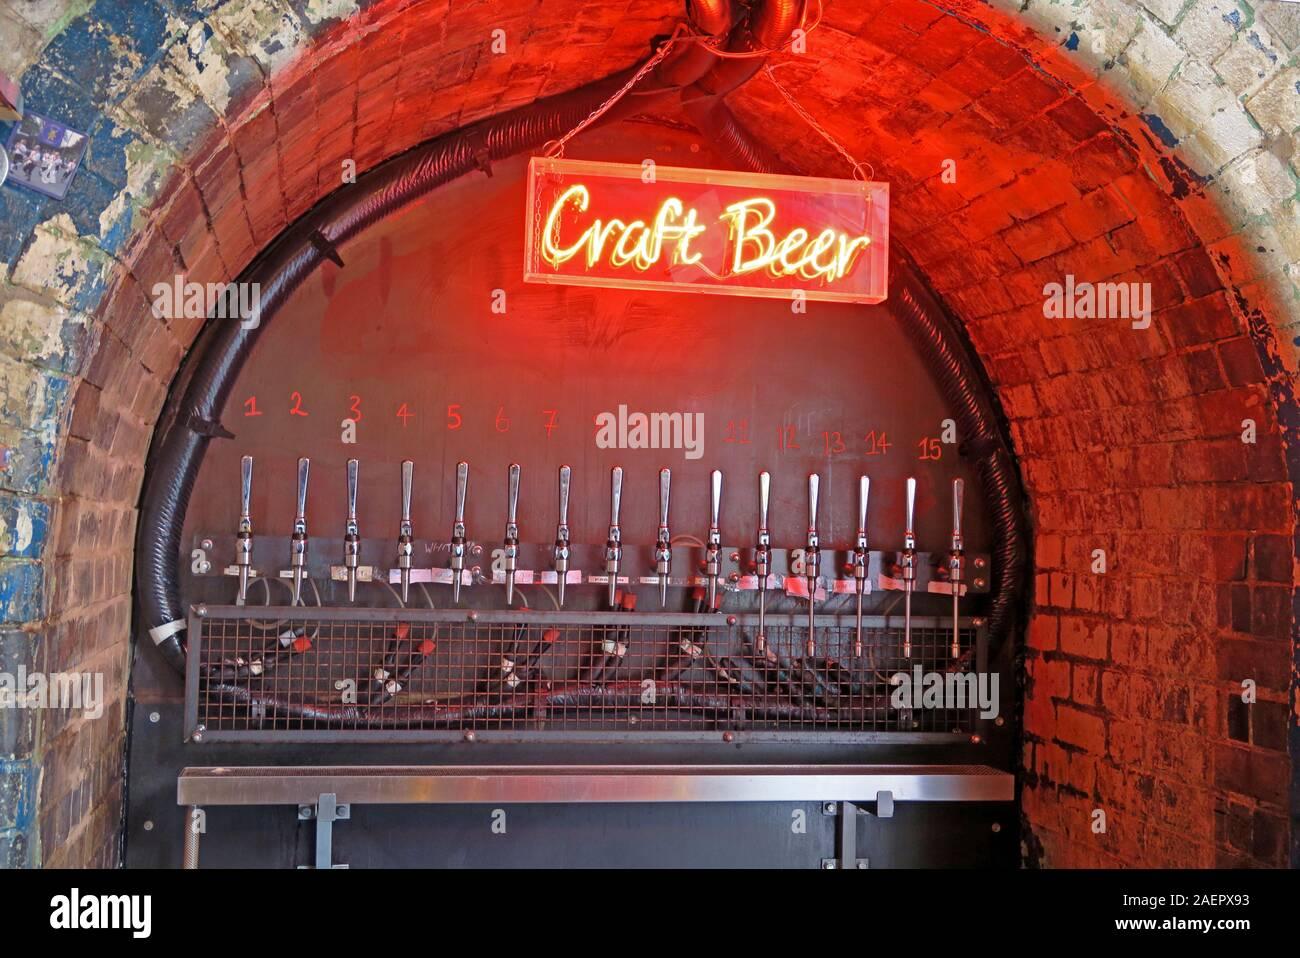 Dieses Stockfoto: Rotes Neon Craft Beer Schild, Craft Beer Pub, The Indian Brewery Company, Snowhill, Arch 16 Livery Street, Birmingham, West Midlands, England, Großbritannien, B3 1EU - 2AEPX9